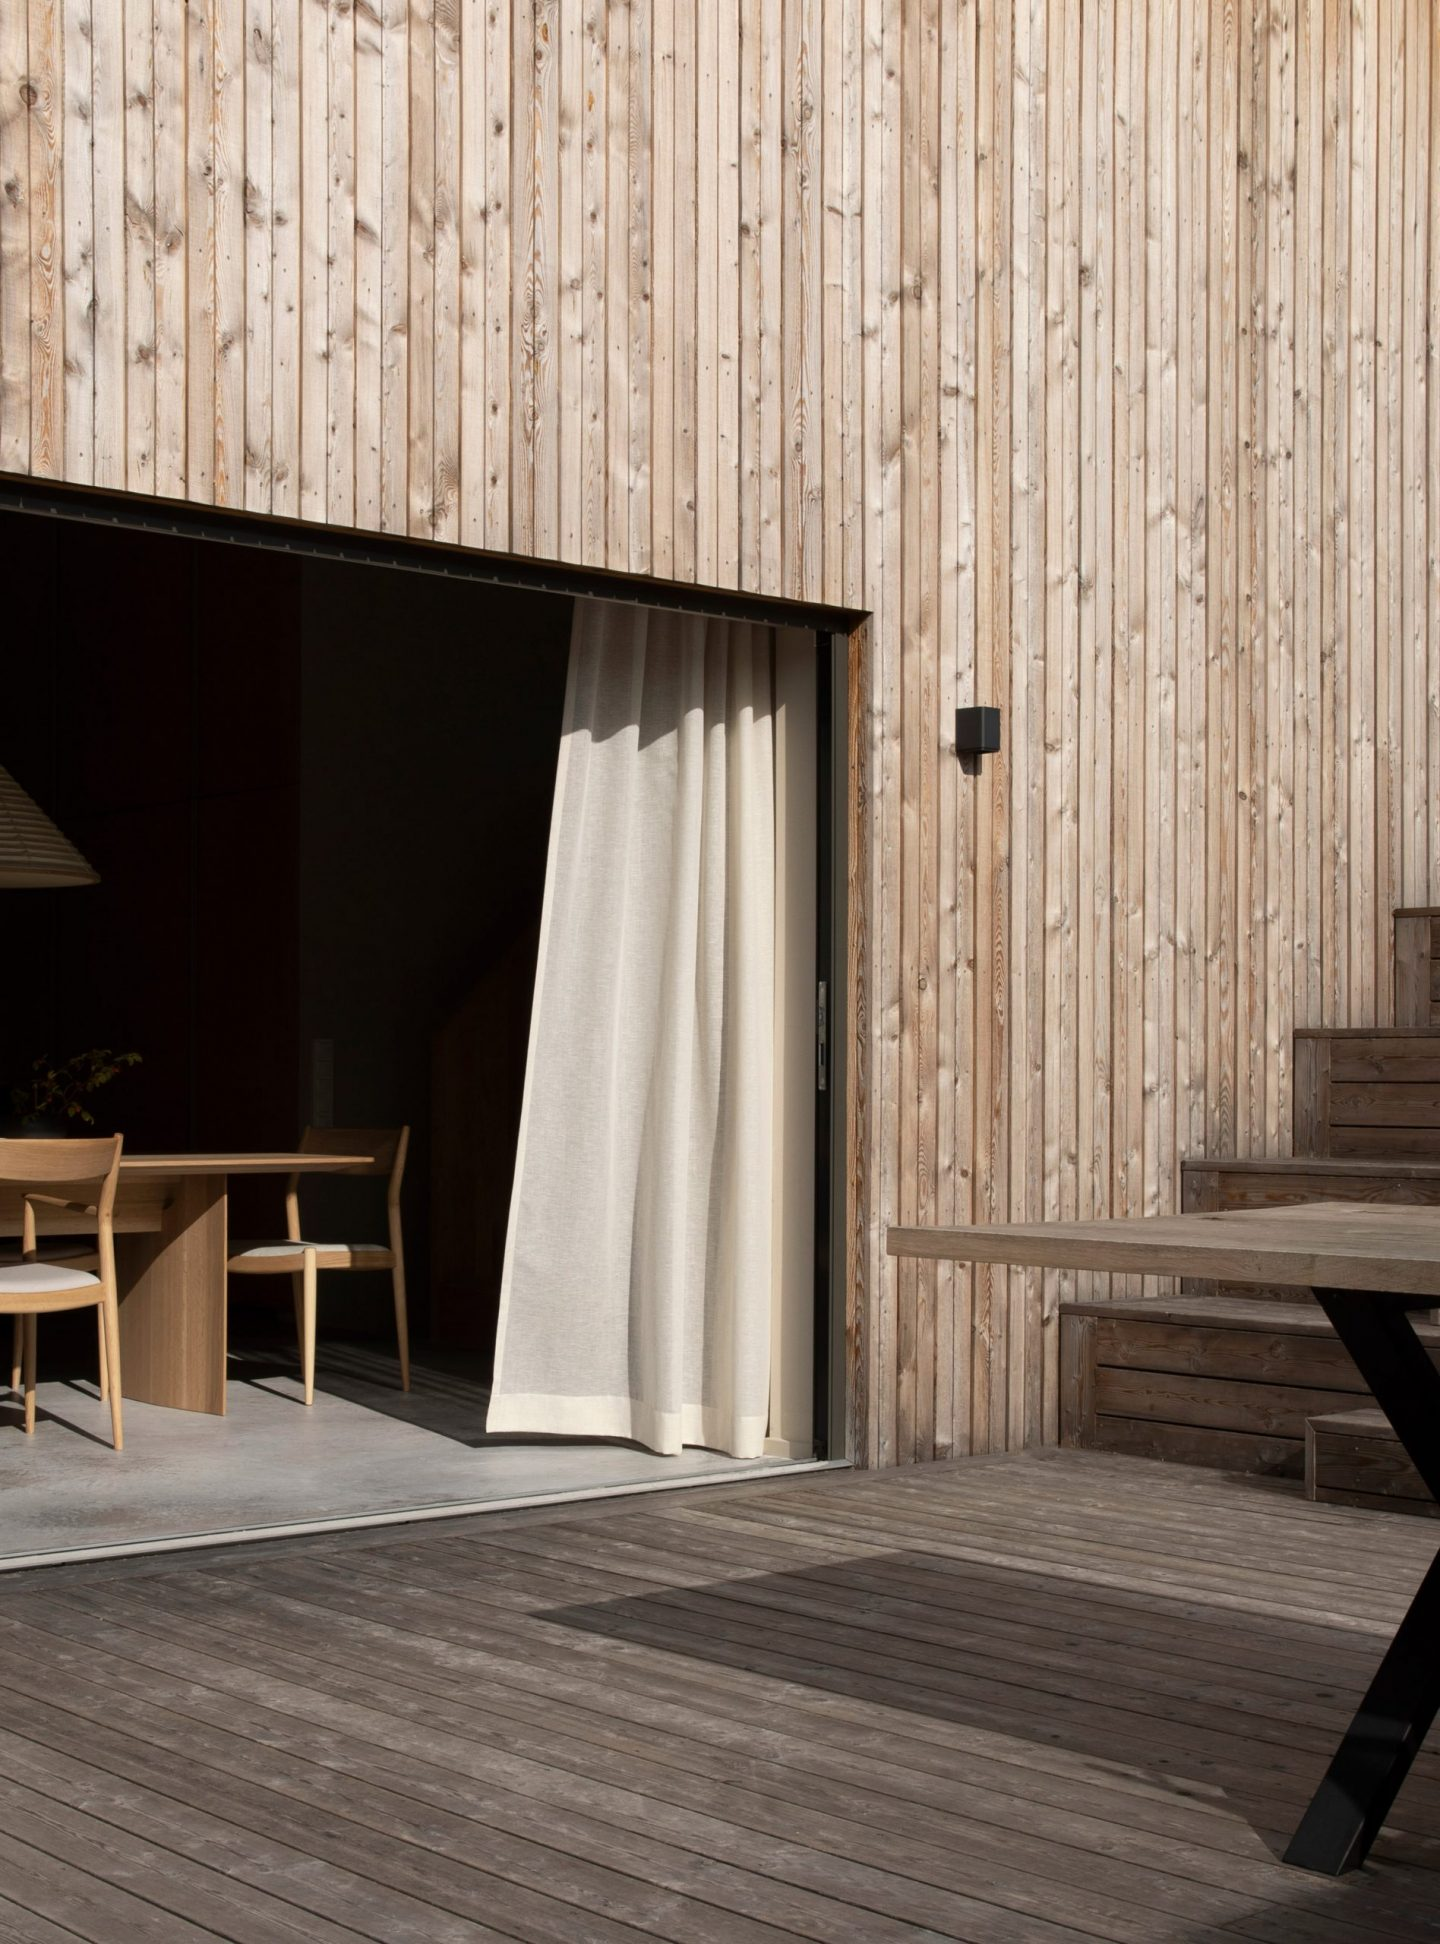 IGNANT-Architecture-Norm-Architects-Archipelago-House-014